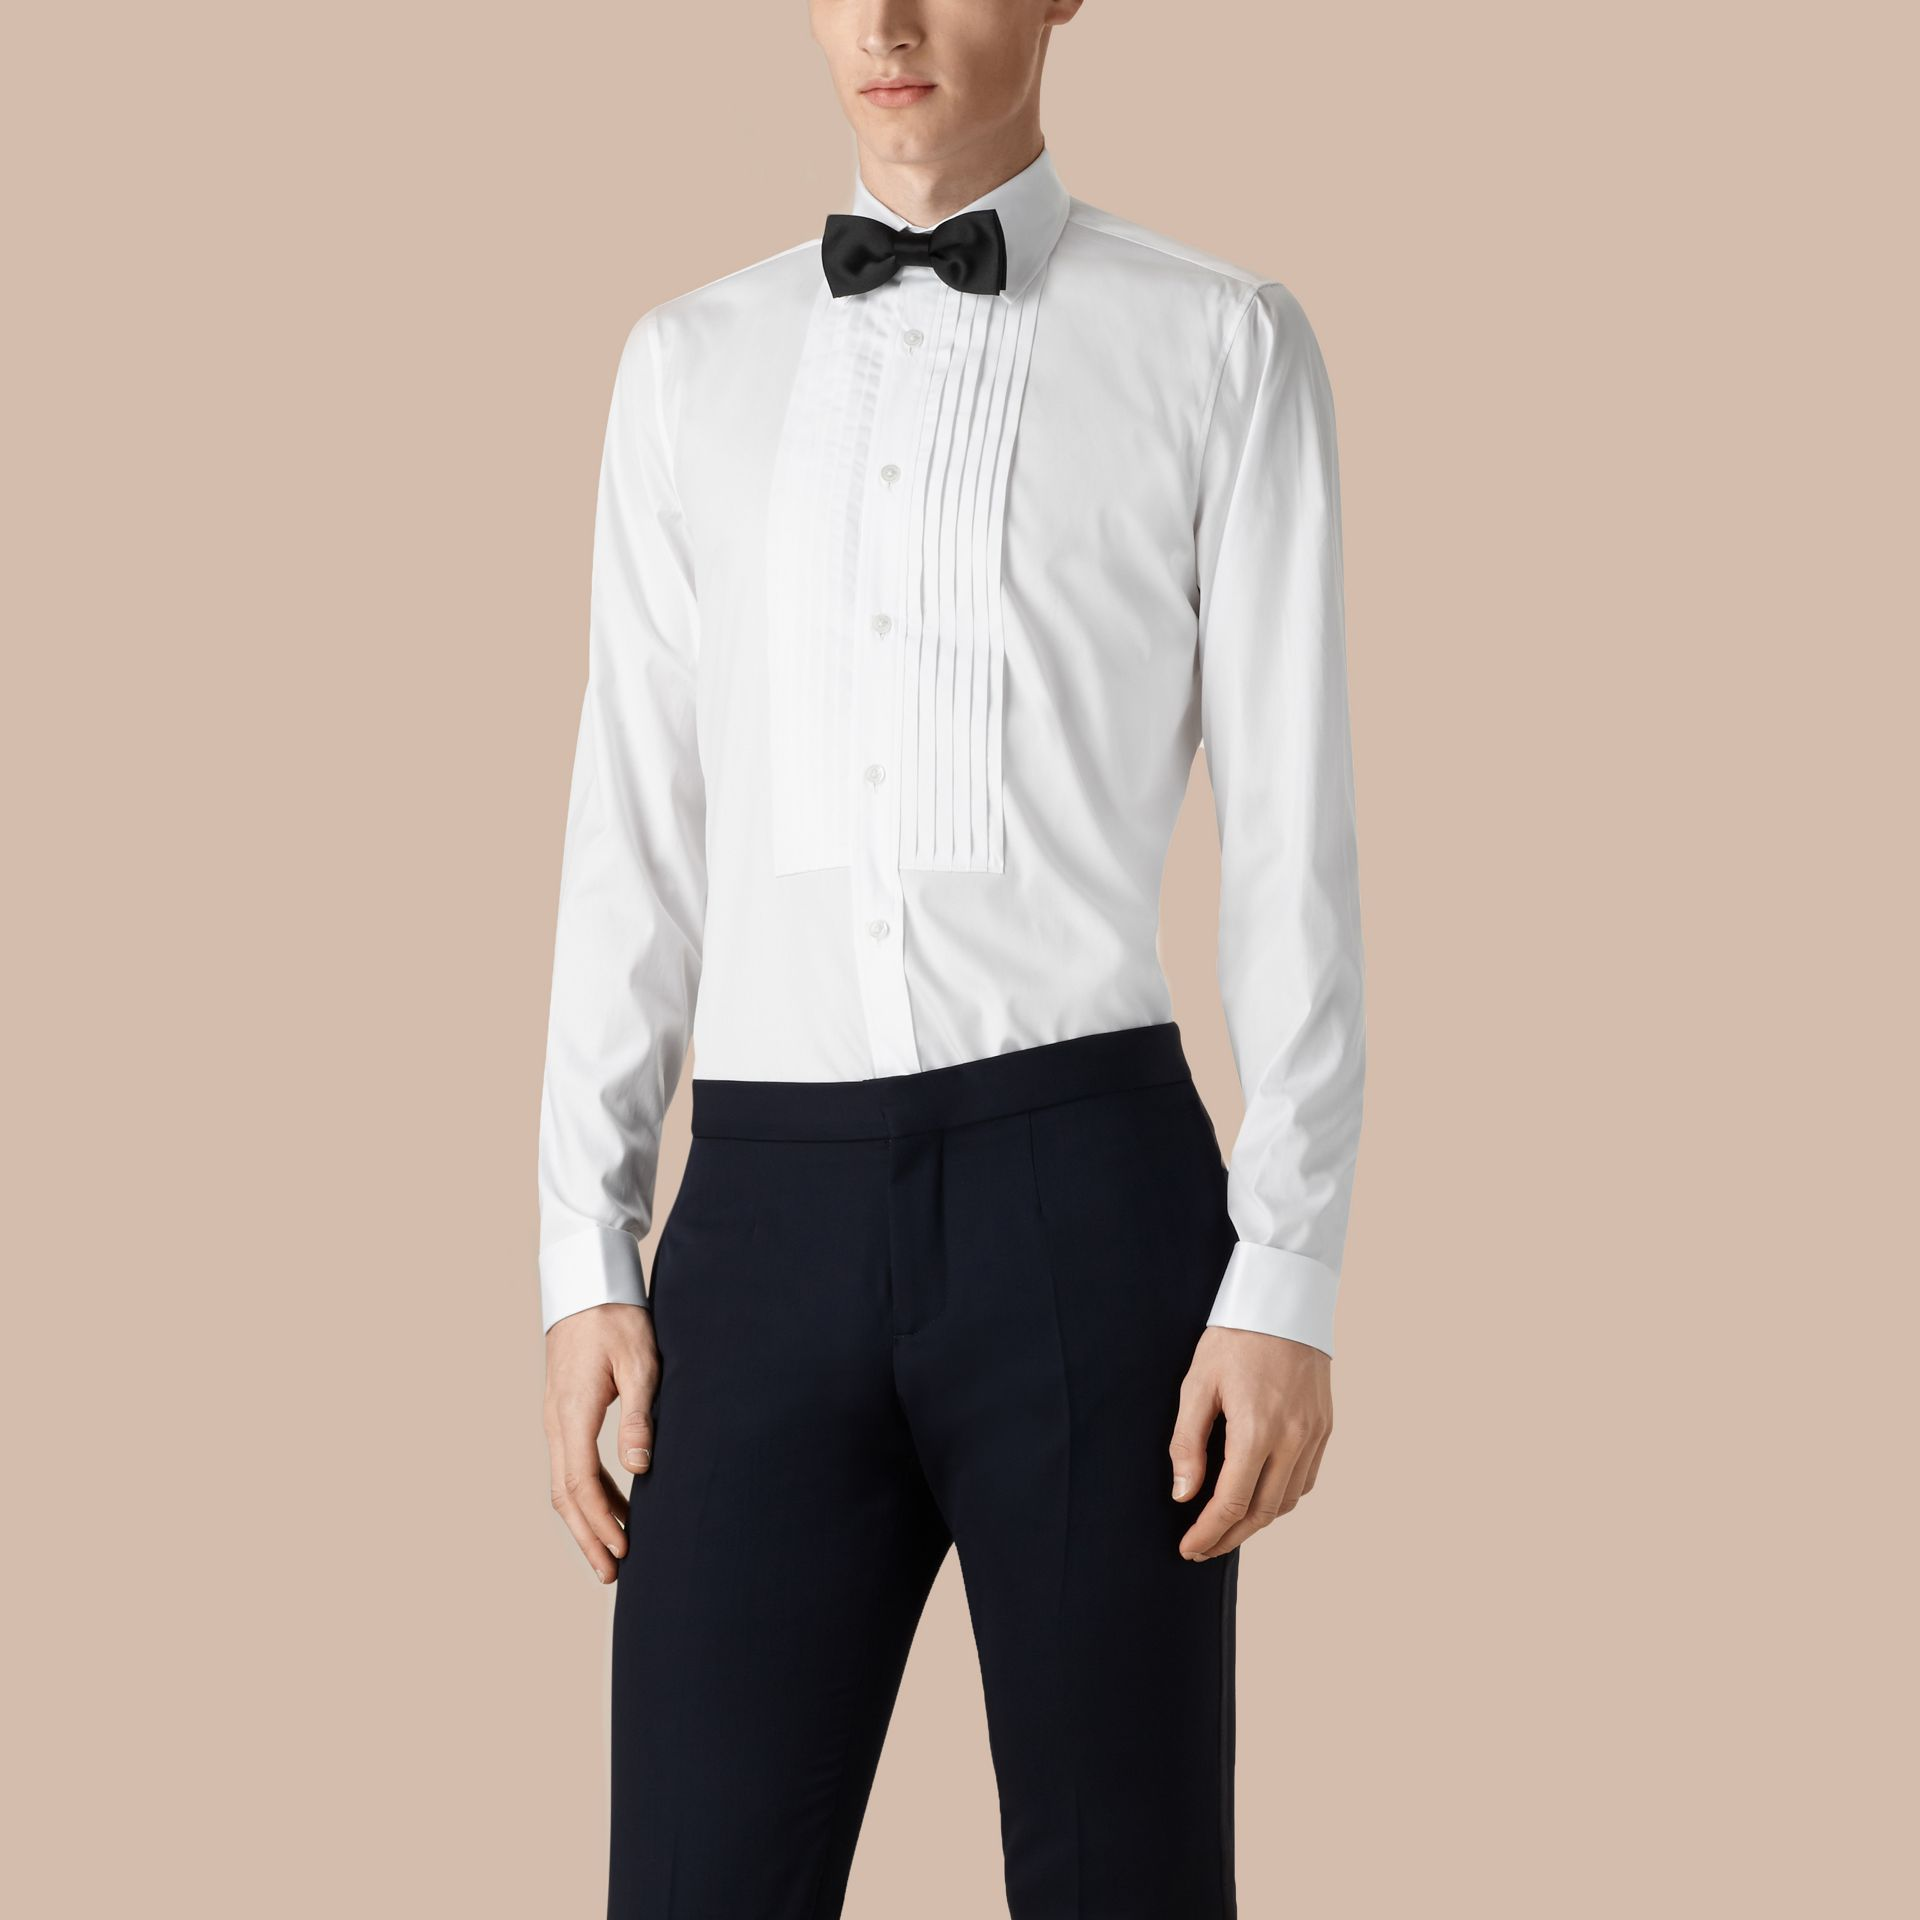 Optic white Cotton Dress Shirt - gallery image 1